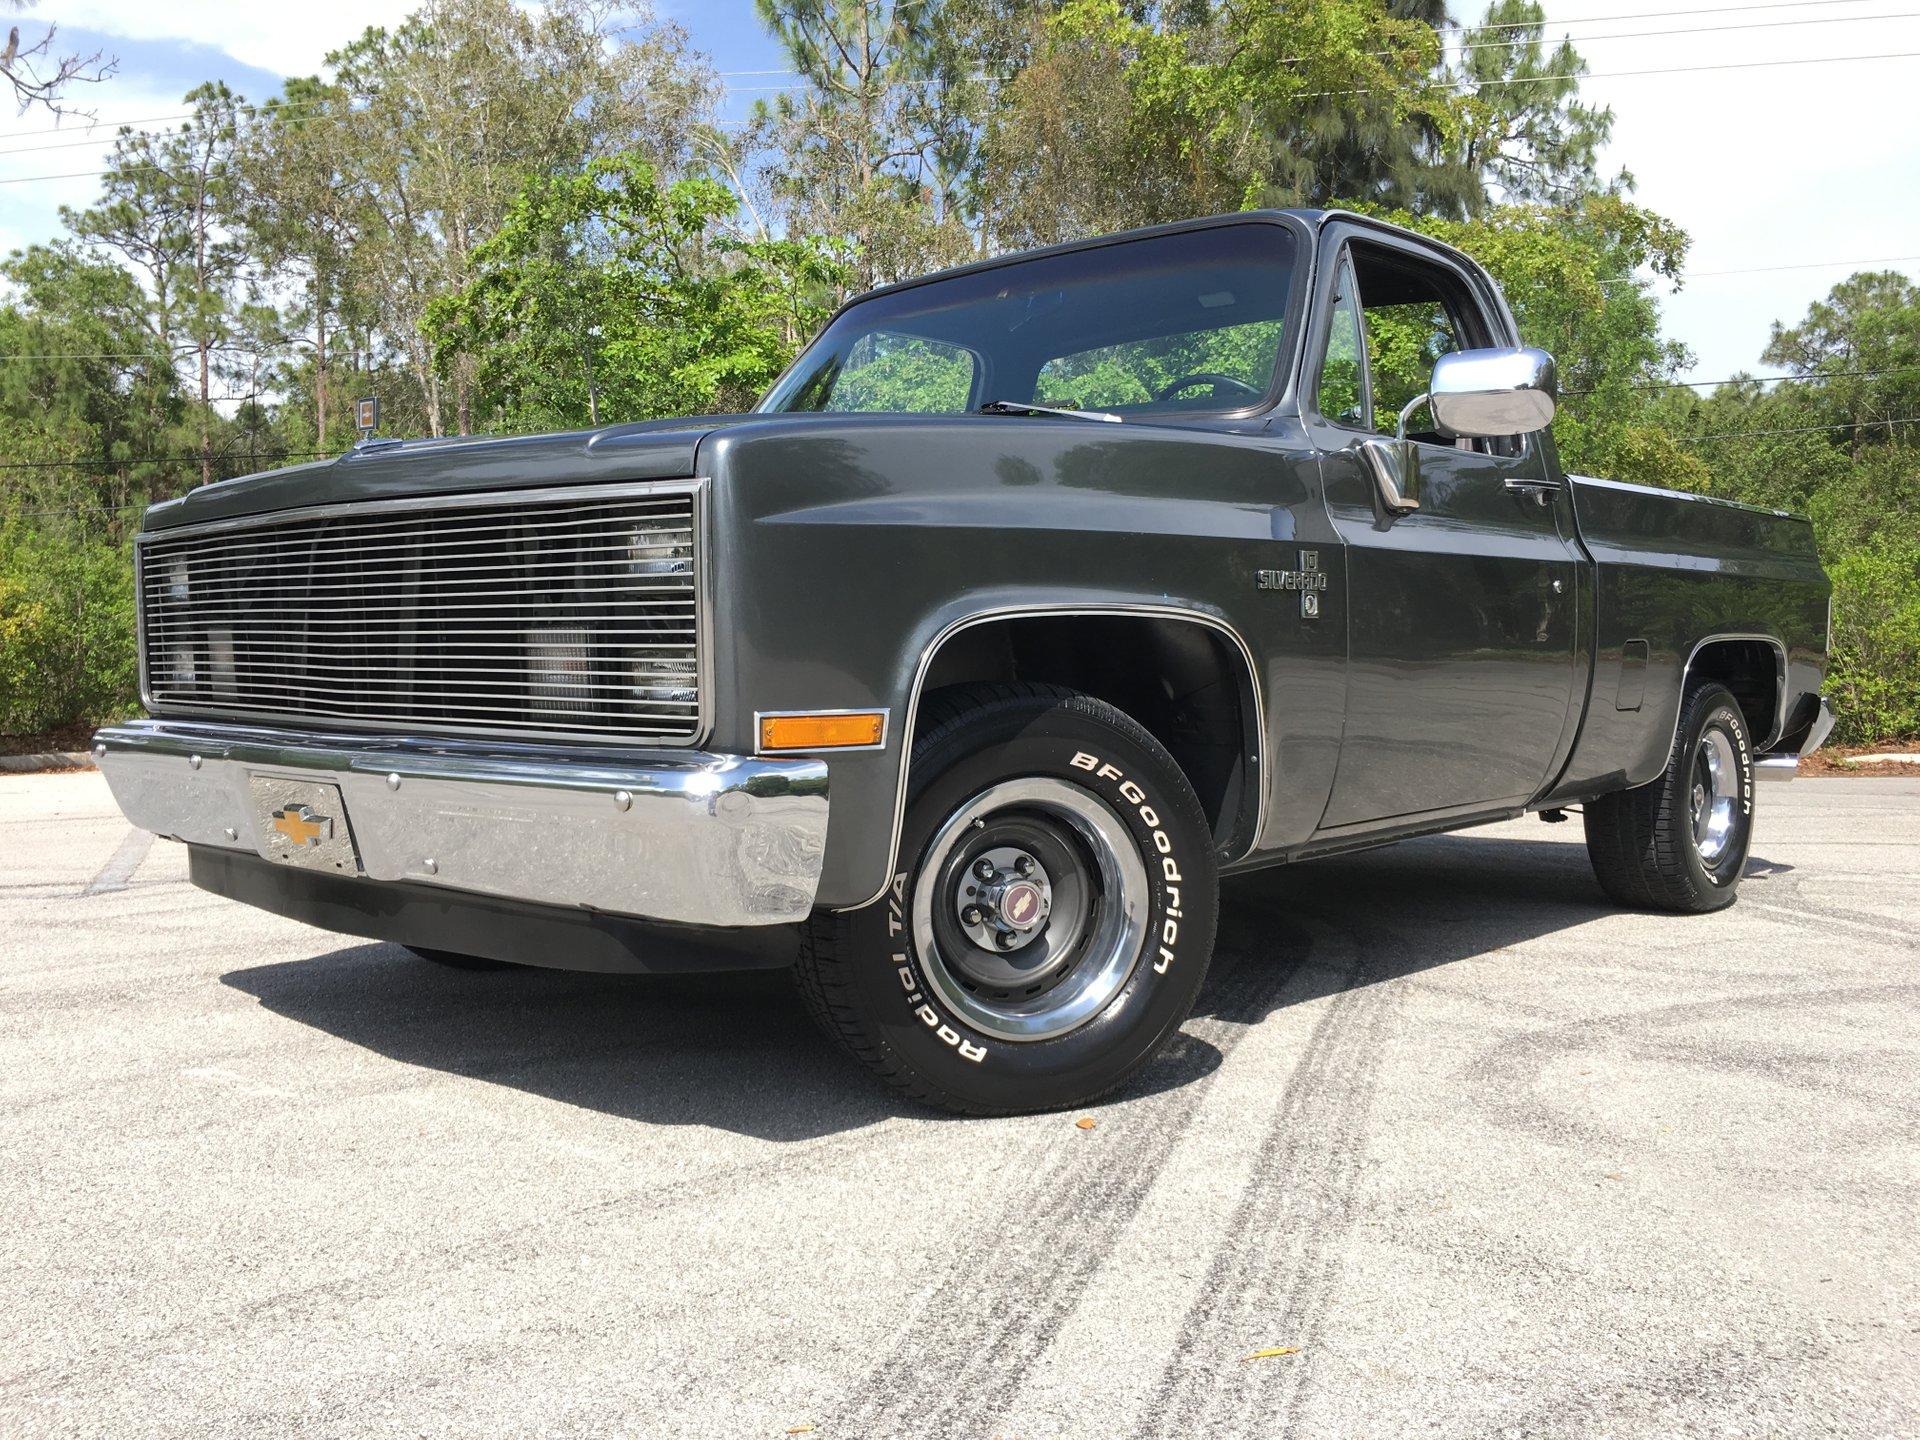 1983 chevrolet c10 silverado pickup